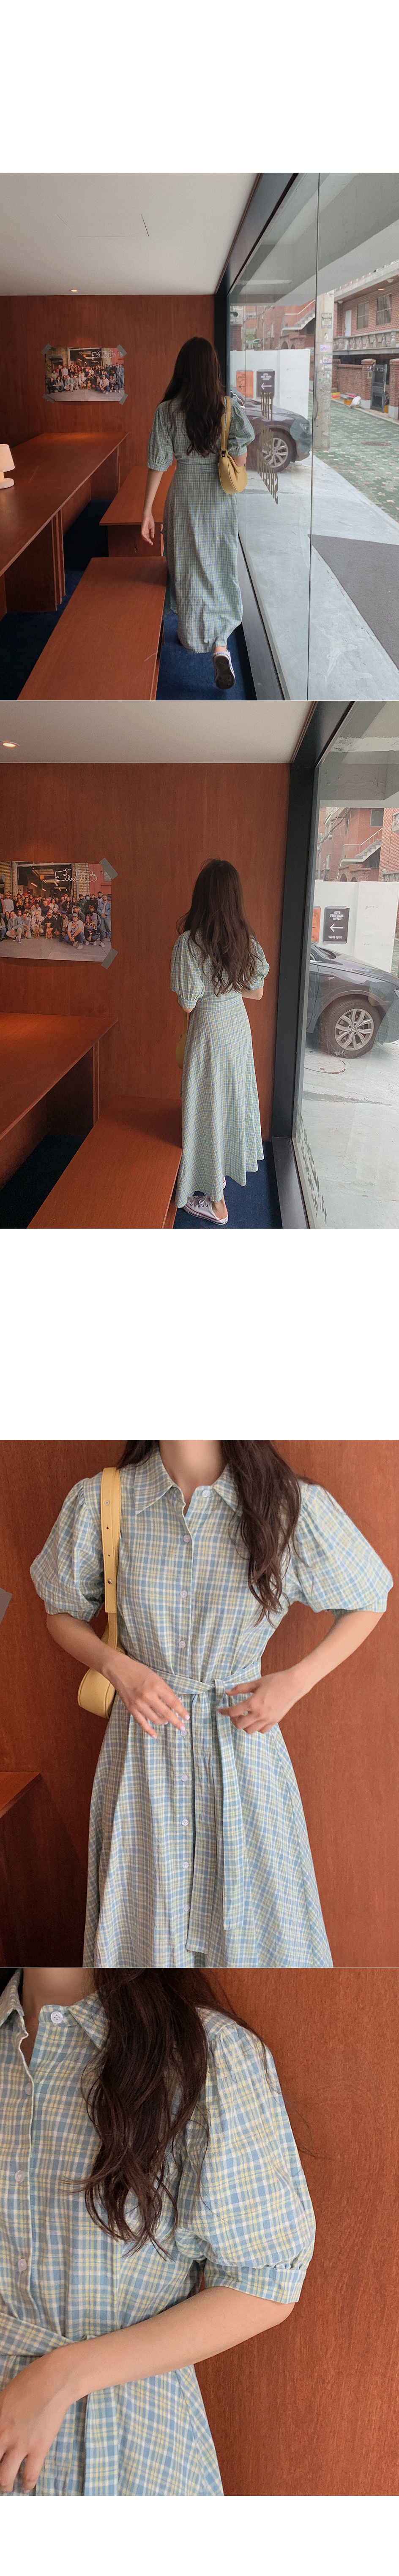 Katsune Check Dress